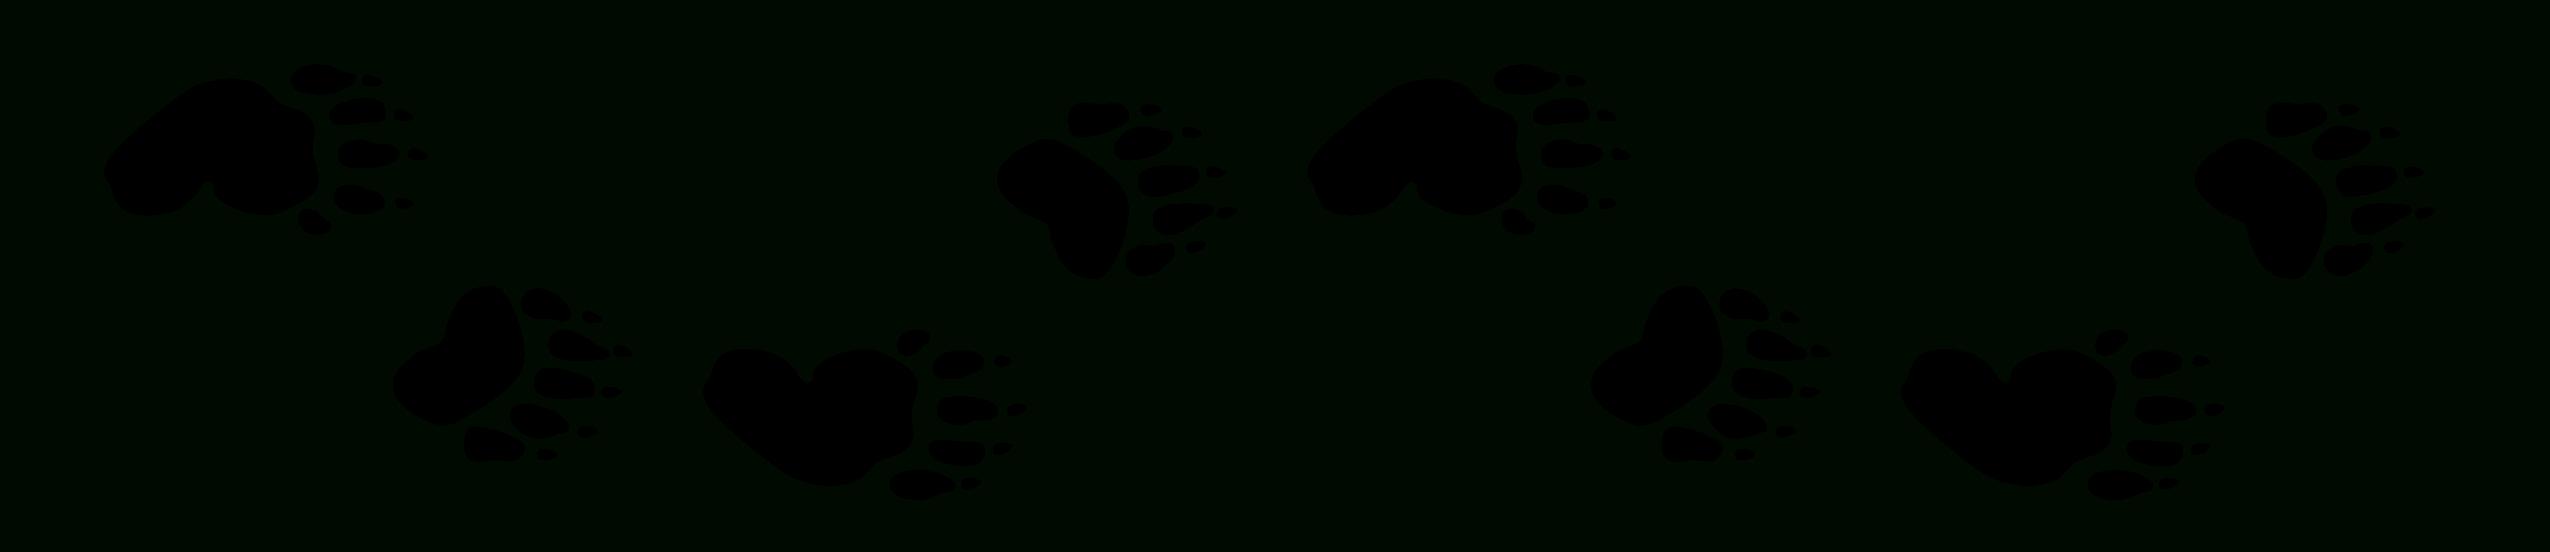 Free Bear Foot Print, Download Free Clip Art, Free Clip Art